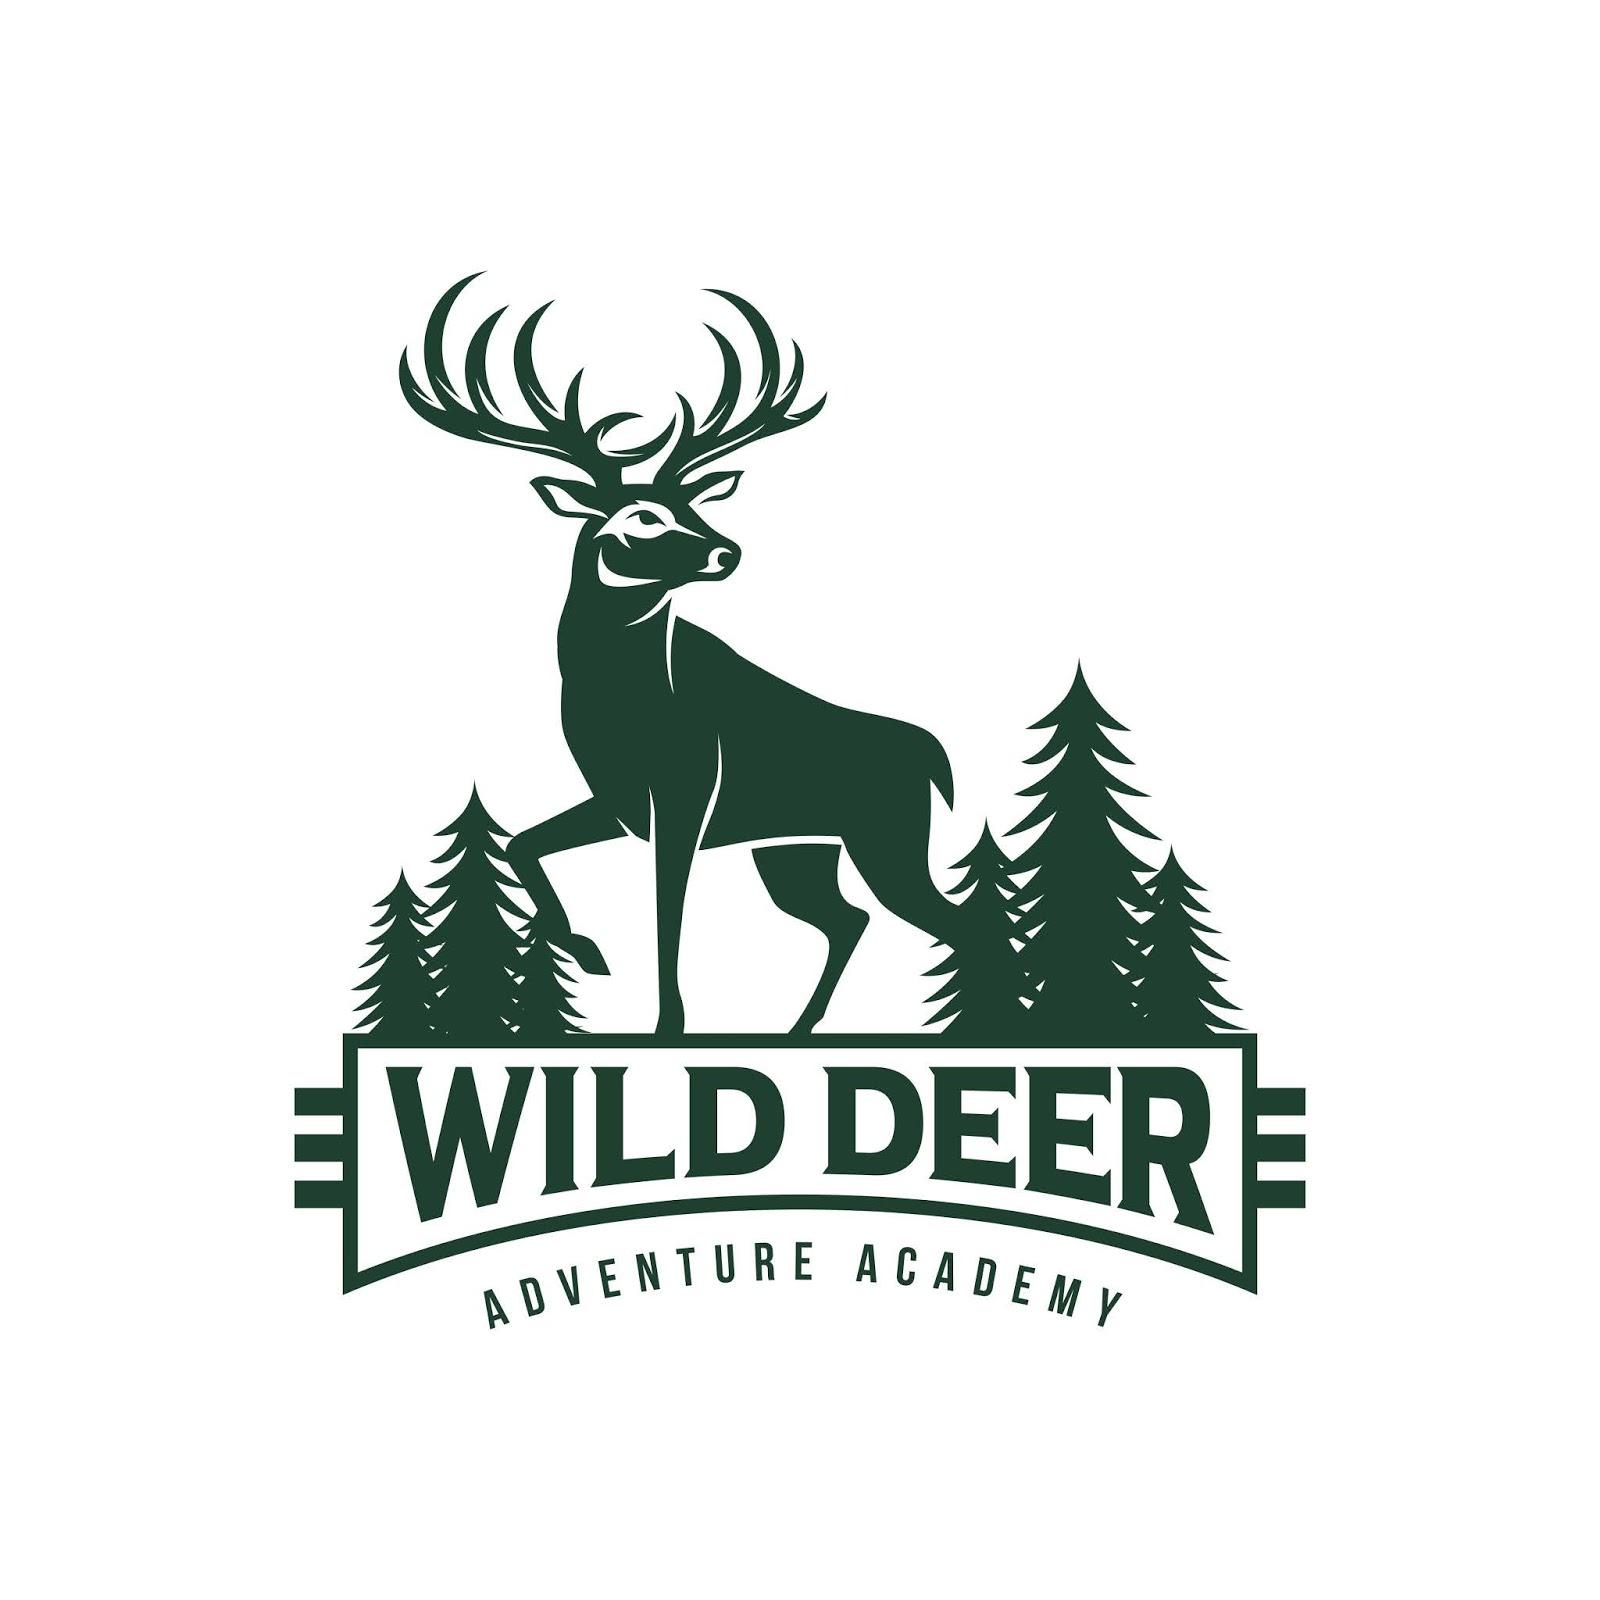 Vintage Deer Hunter Logo Free Download Vector CDR, AI, EPS and PNG Formats